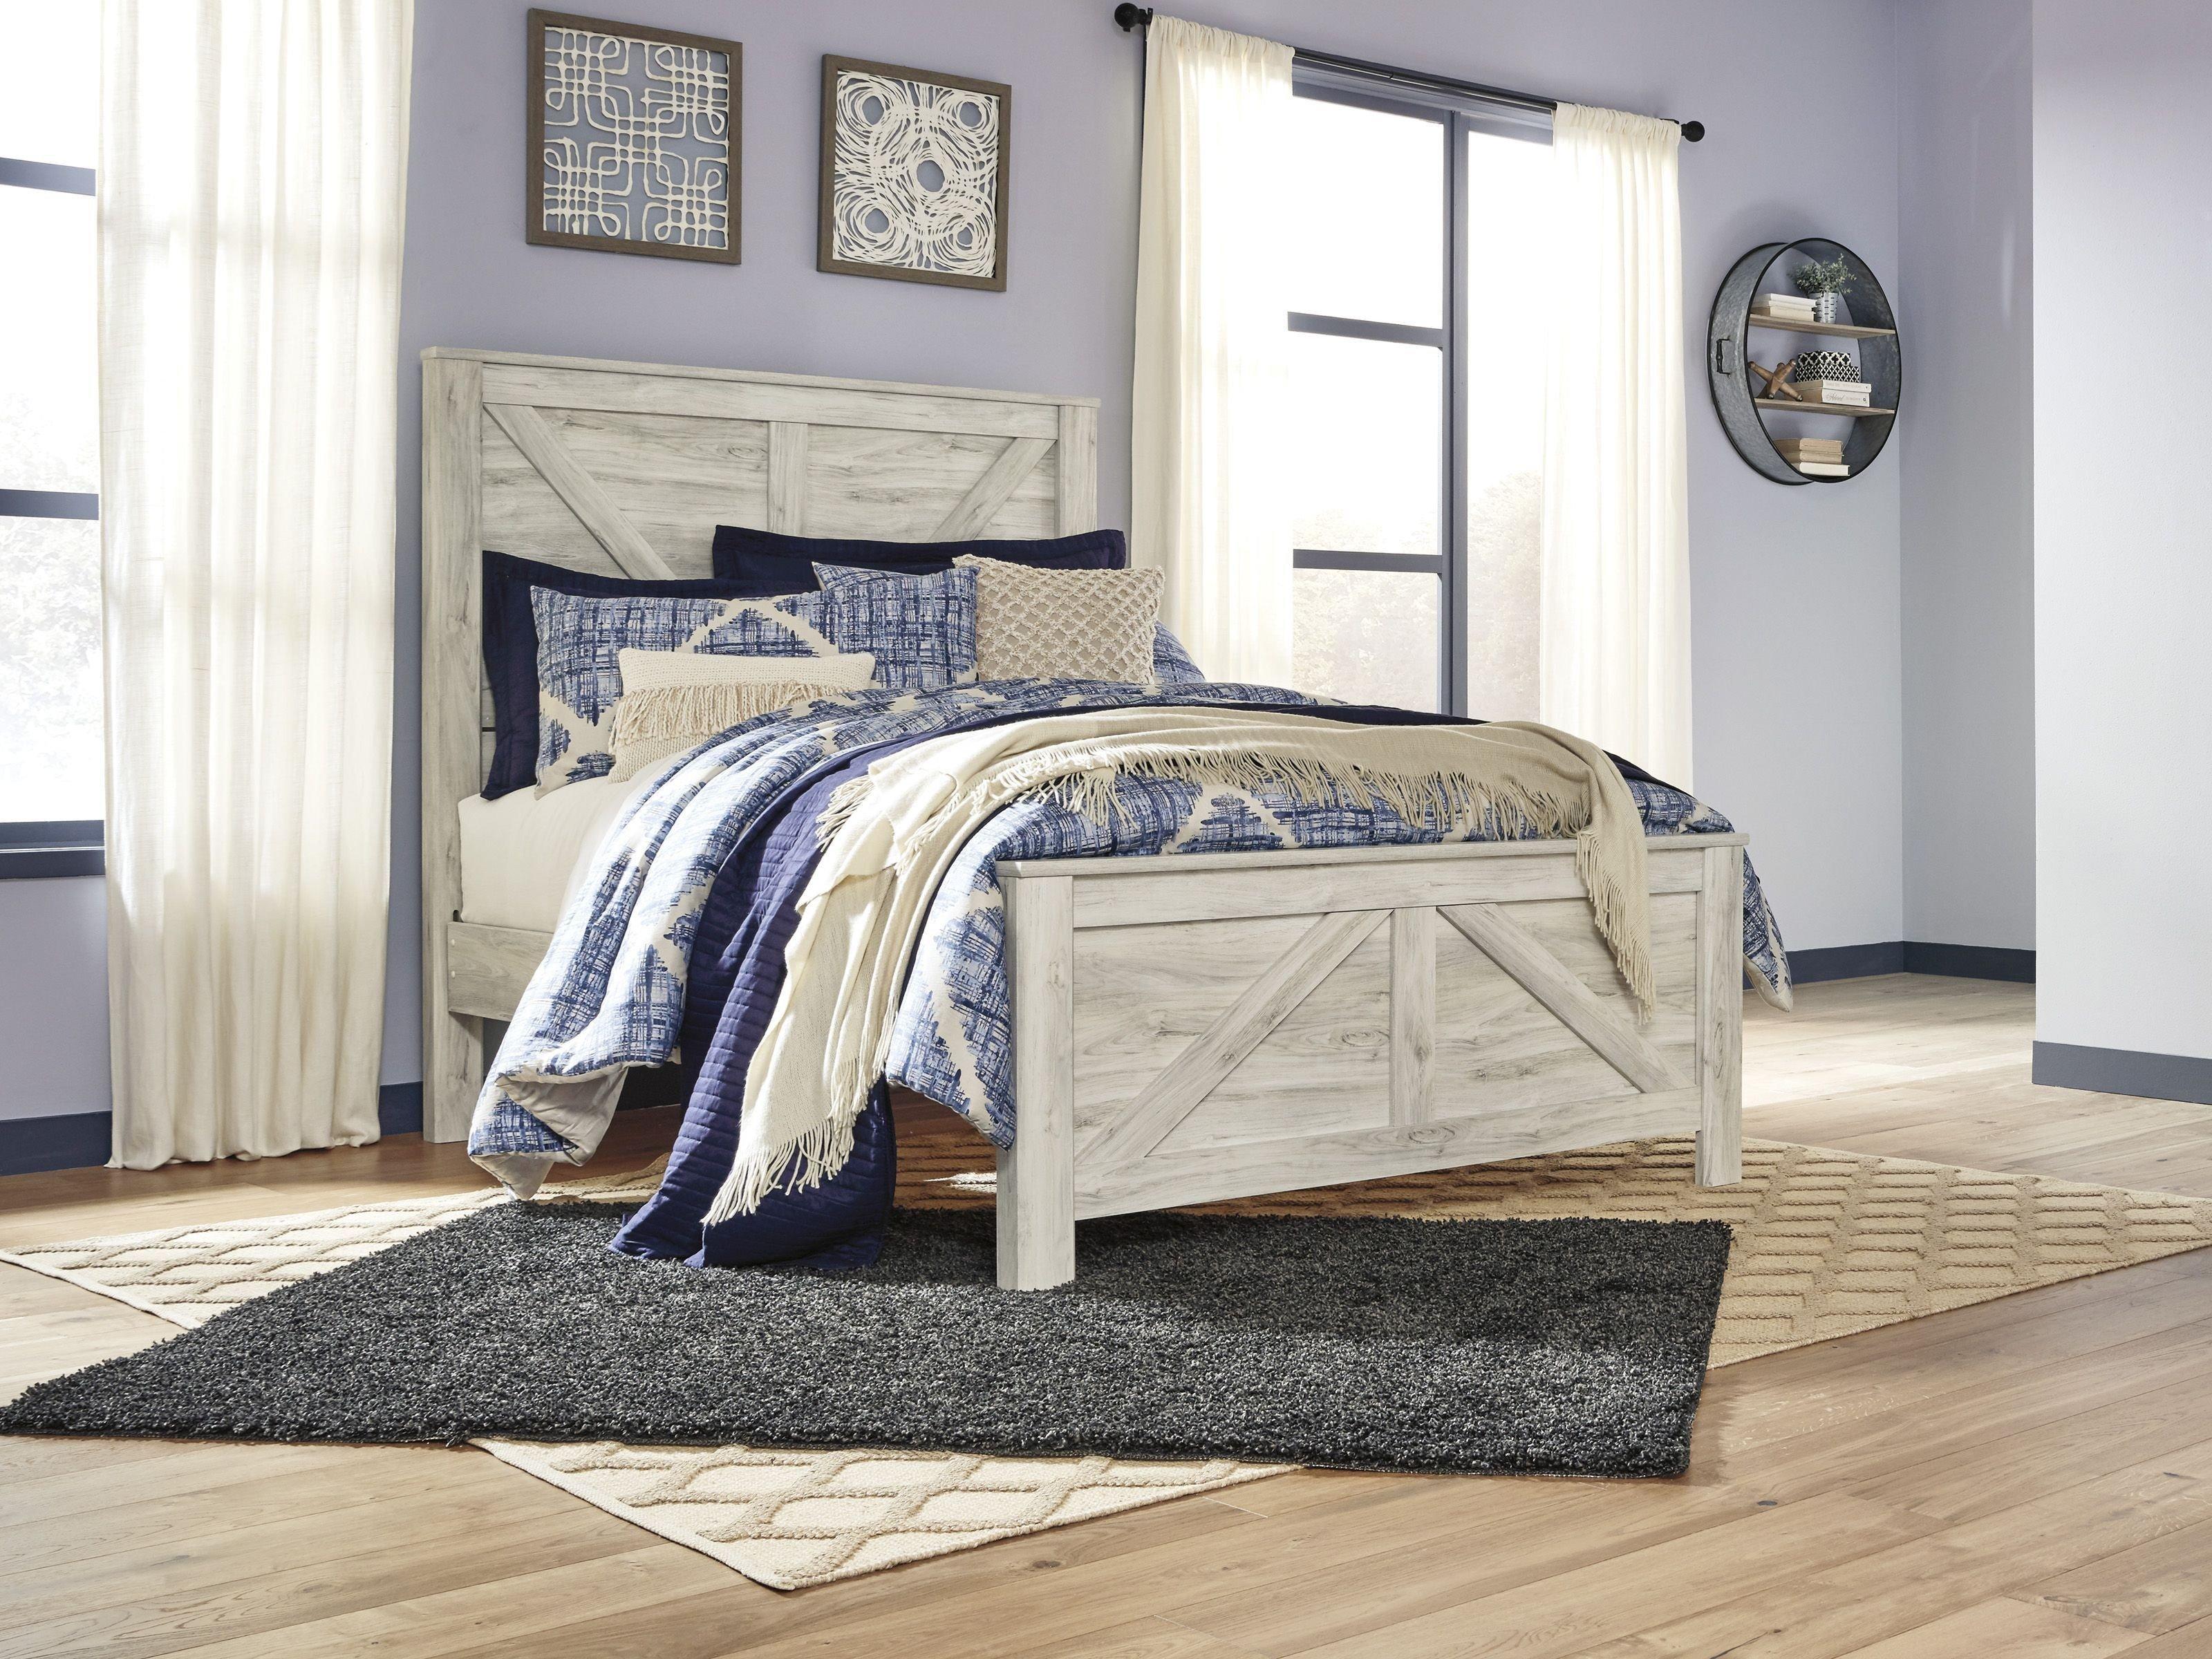 White Washed Bedroom Furniture Set New Bellaby Whitewash Panel Bedroom Set